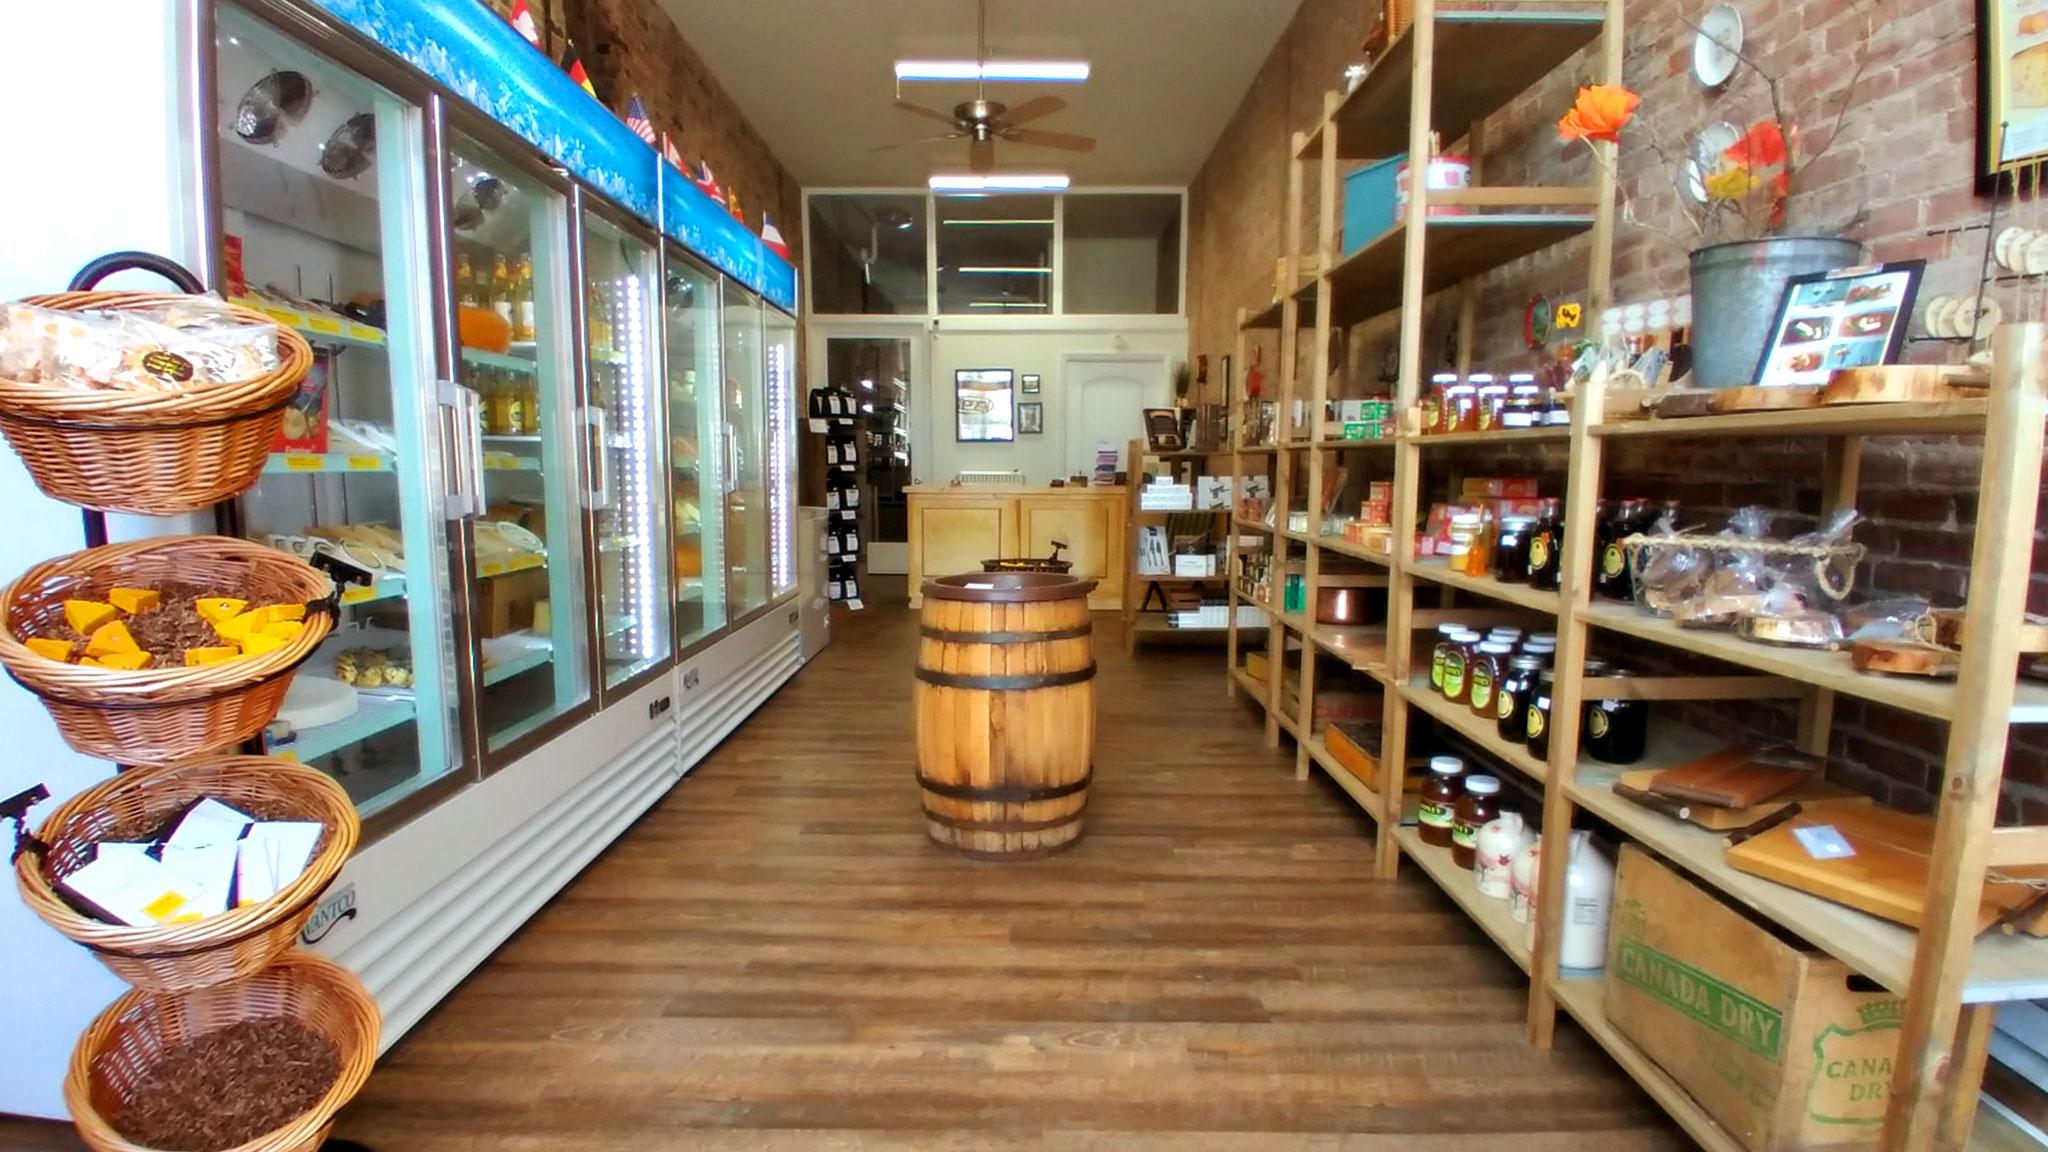 Interior of the cheese shop at 19 Main Street.